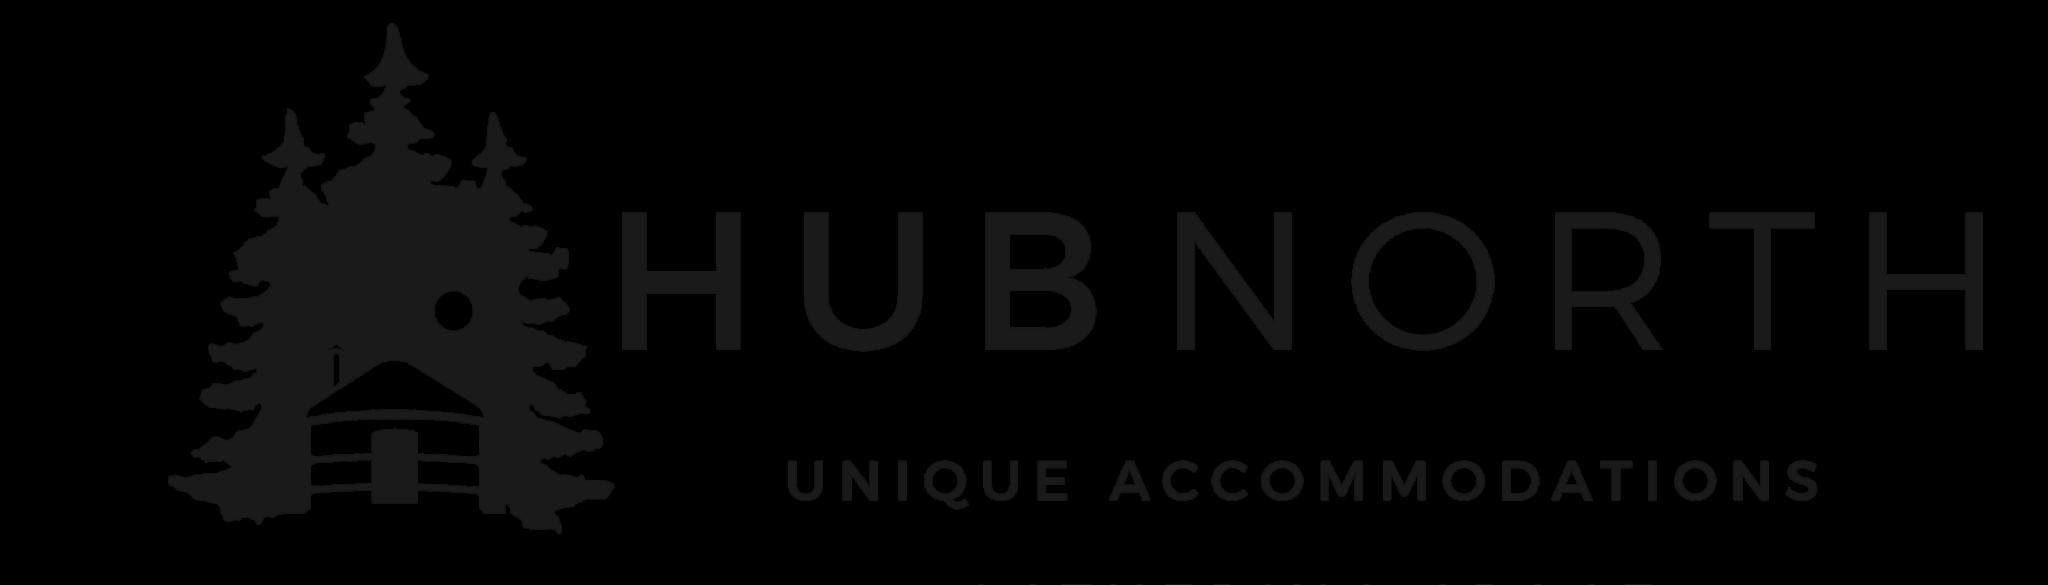 Hubnorth logo